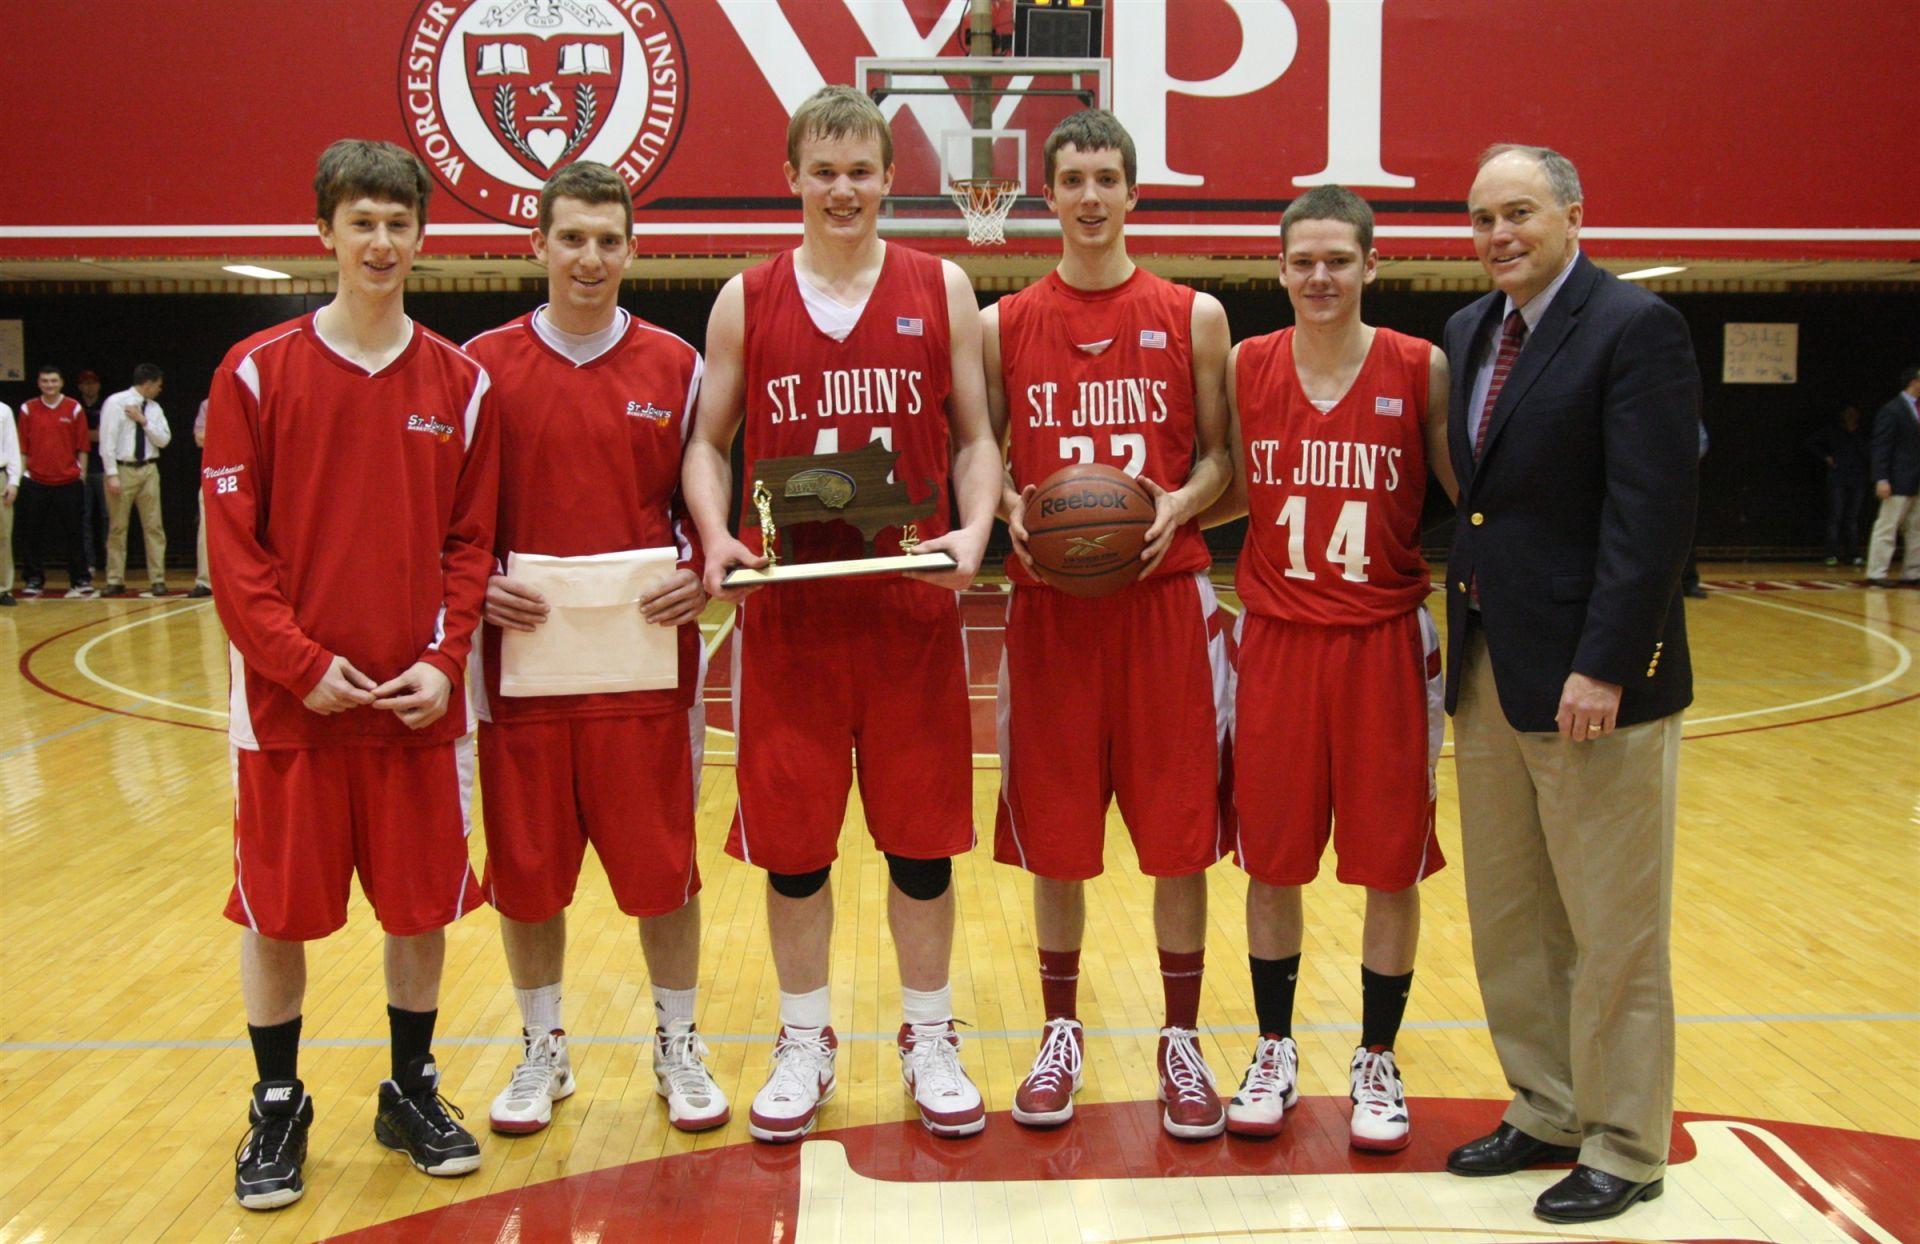 saint john's high school | basketball